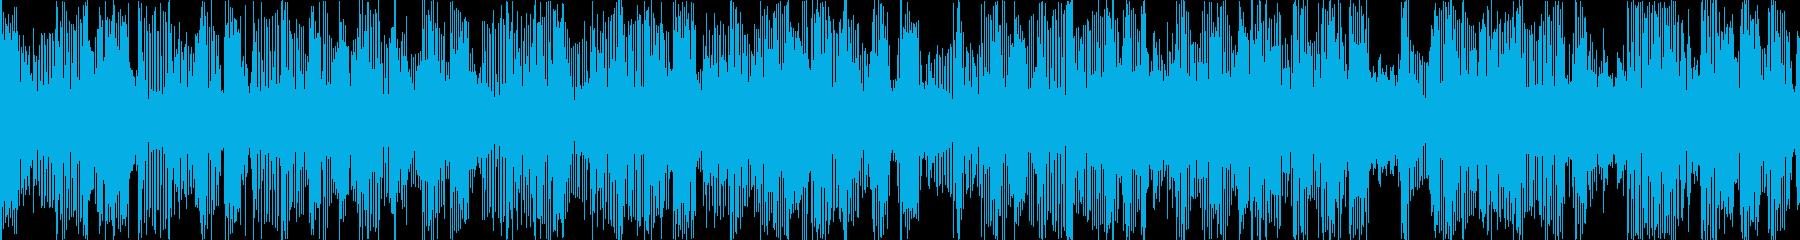 8bitピコピコ(メロディー2)の再生済みの波形